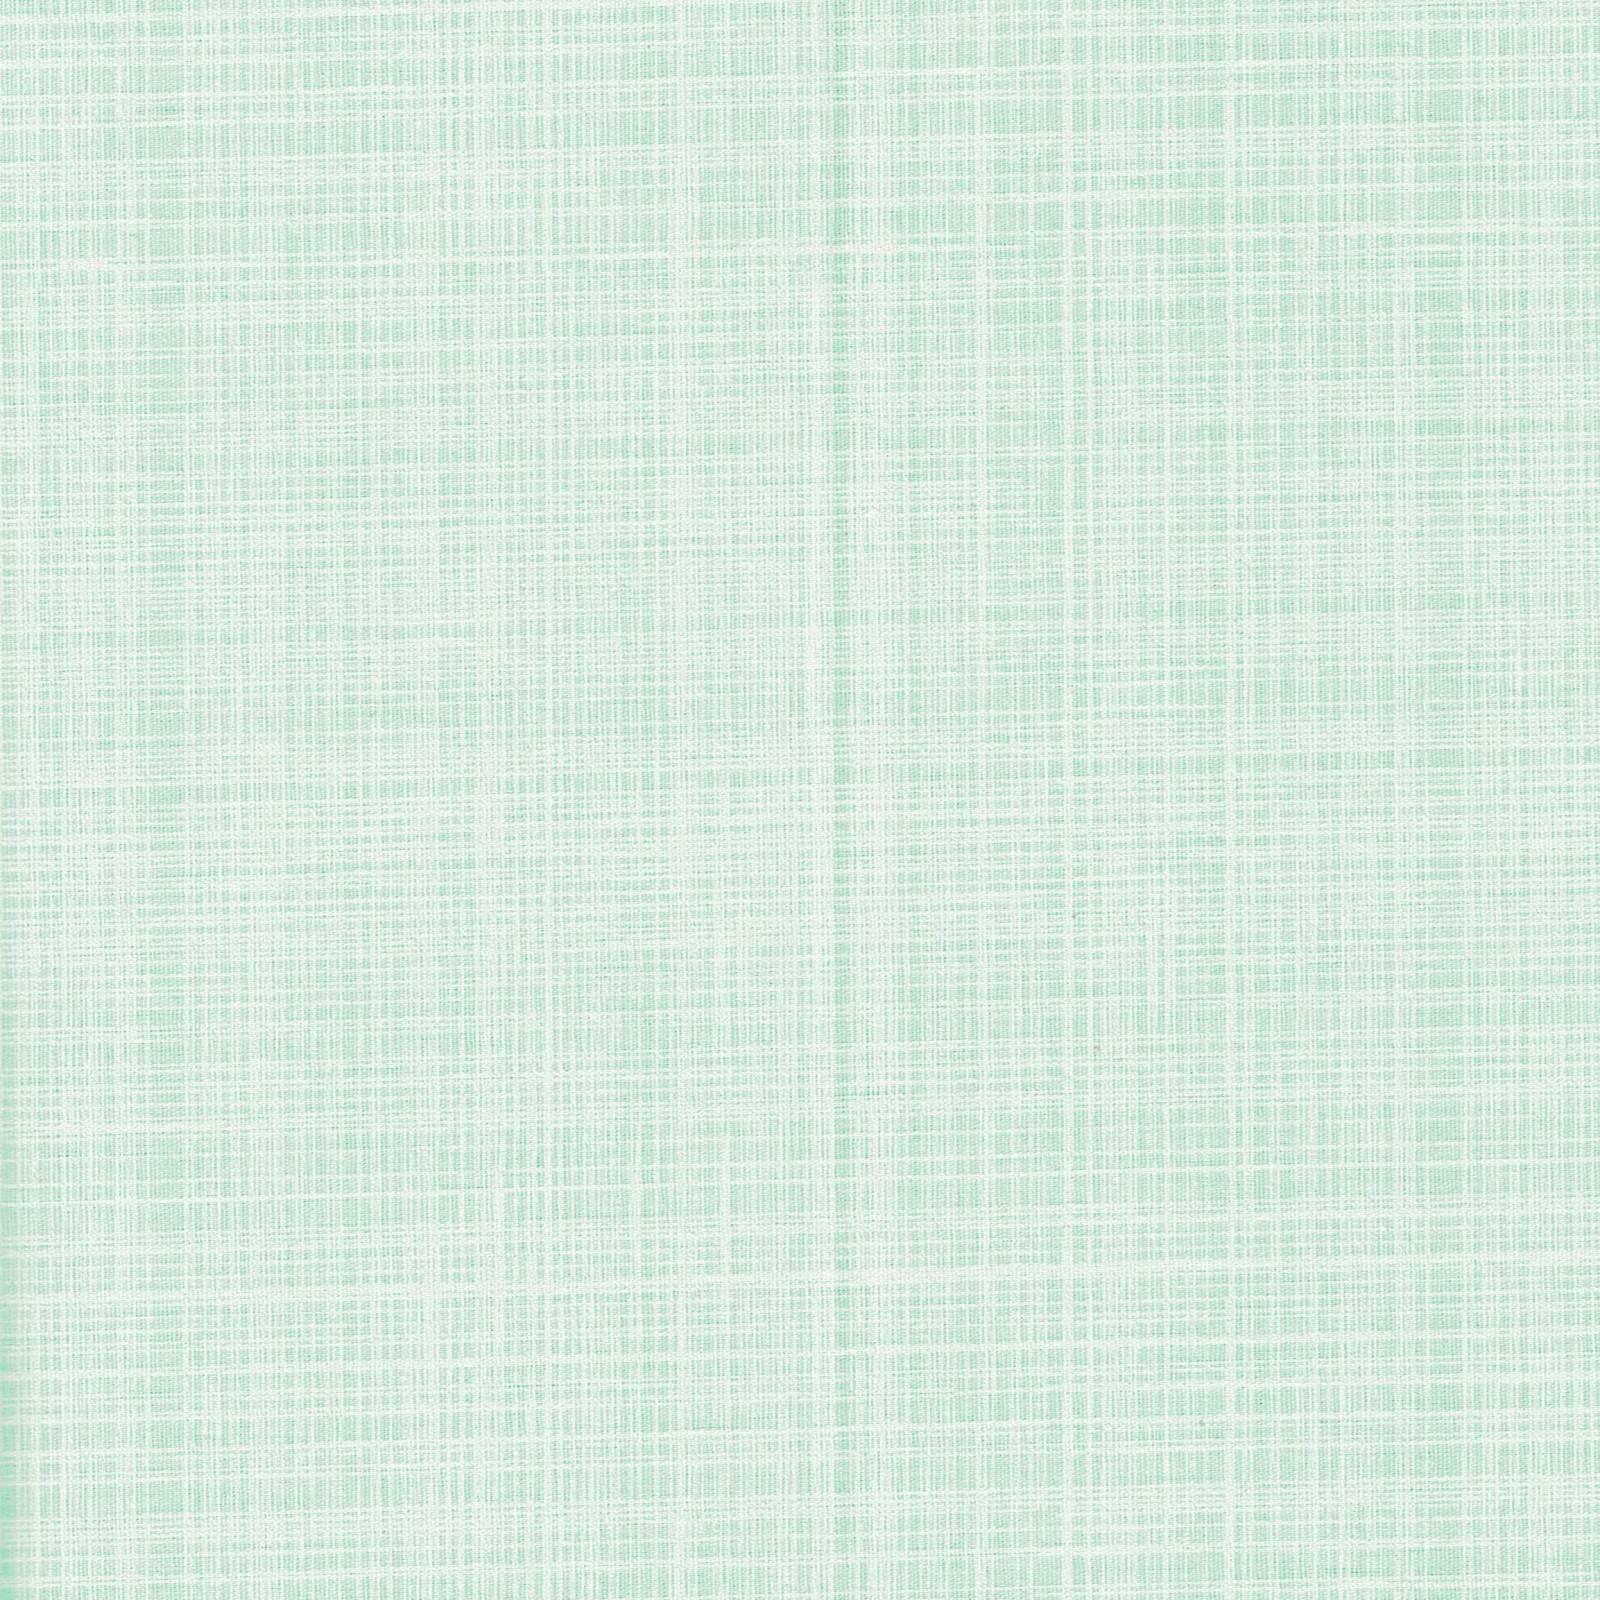 Textura Riscada Verde Água Claro Ref. 1292 Cor 83 Peripan - Armarinhos Nodari